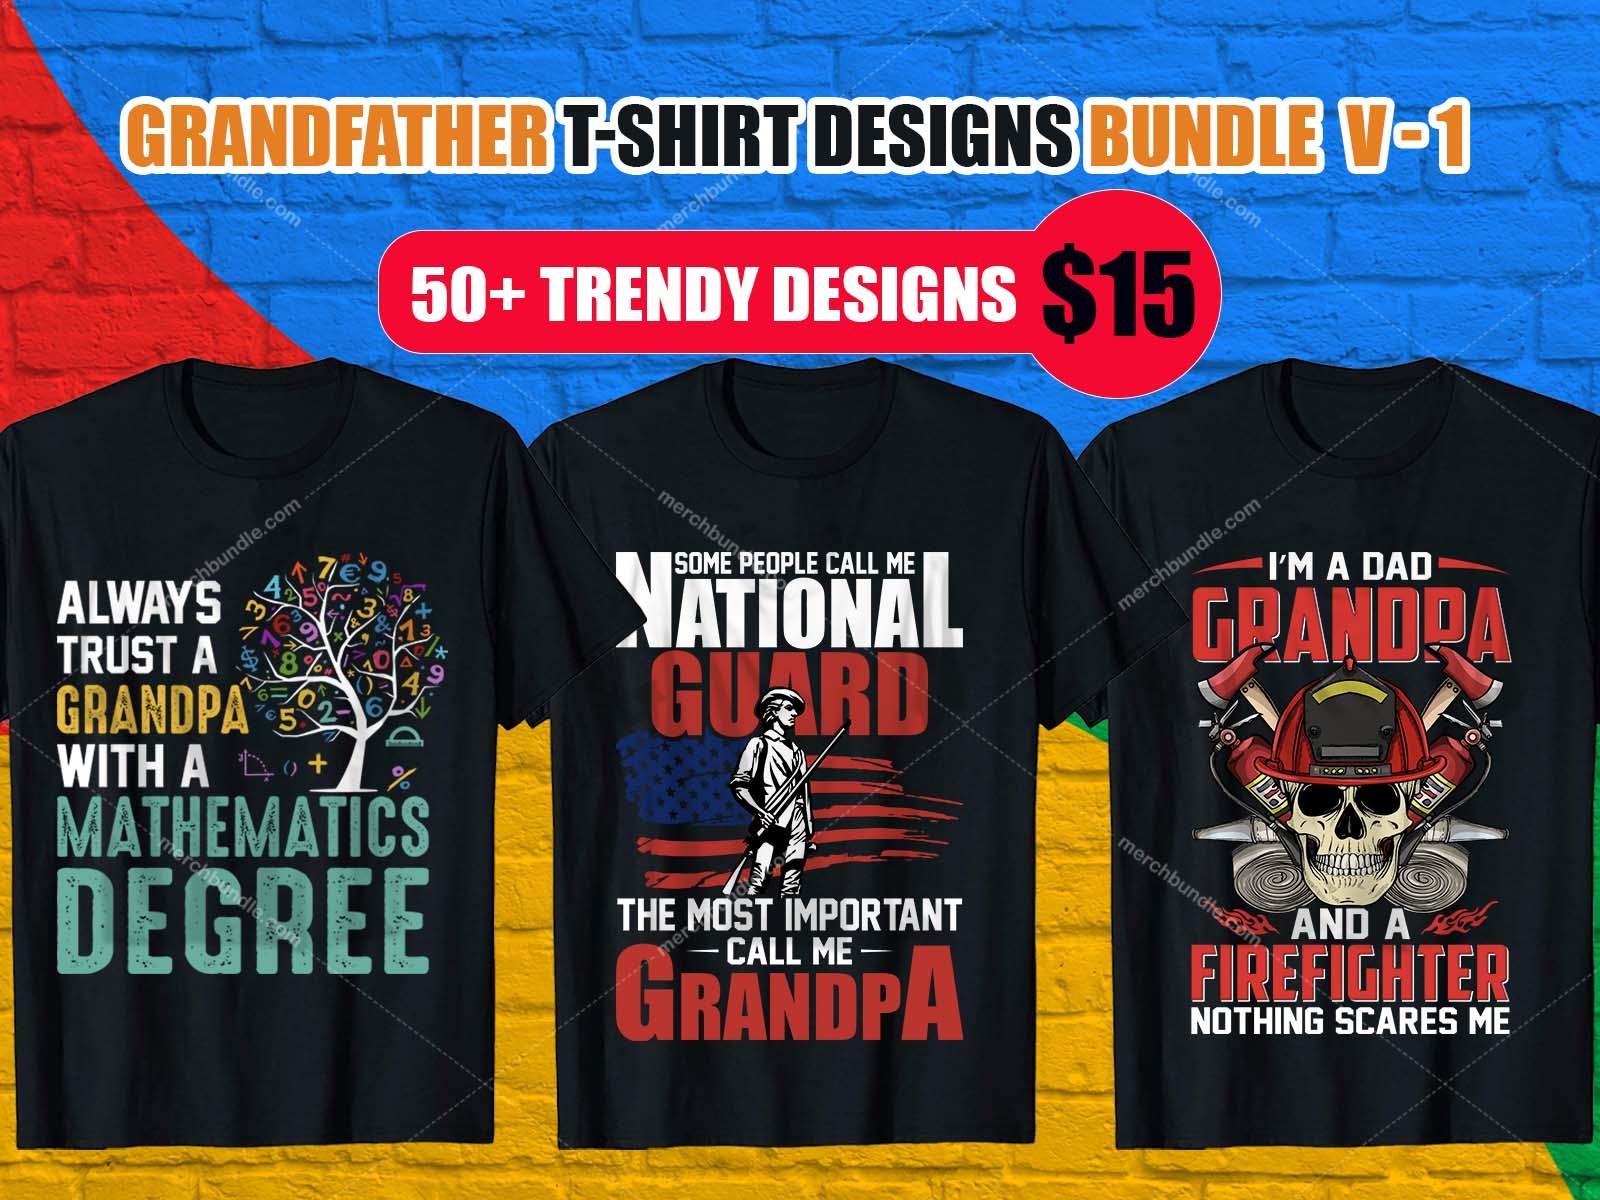 GrandFather Shirt Design Bundle